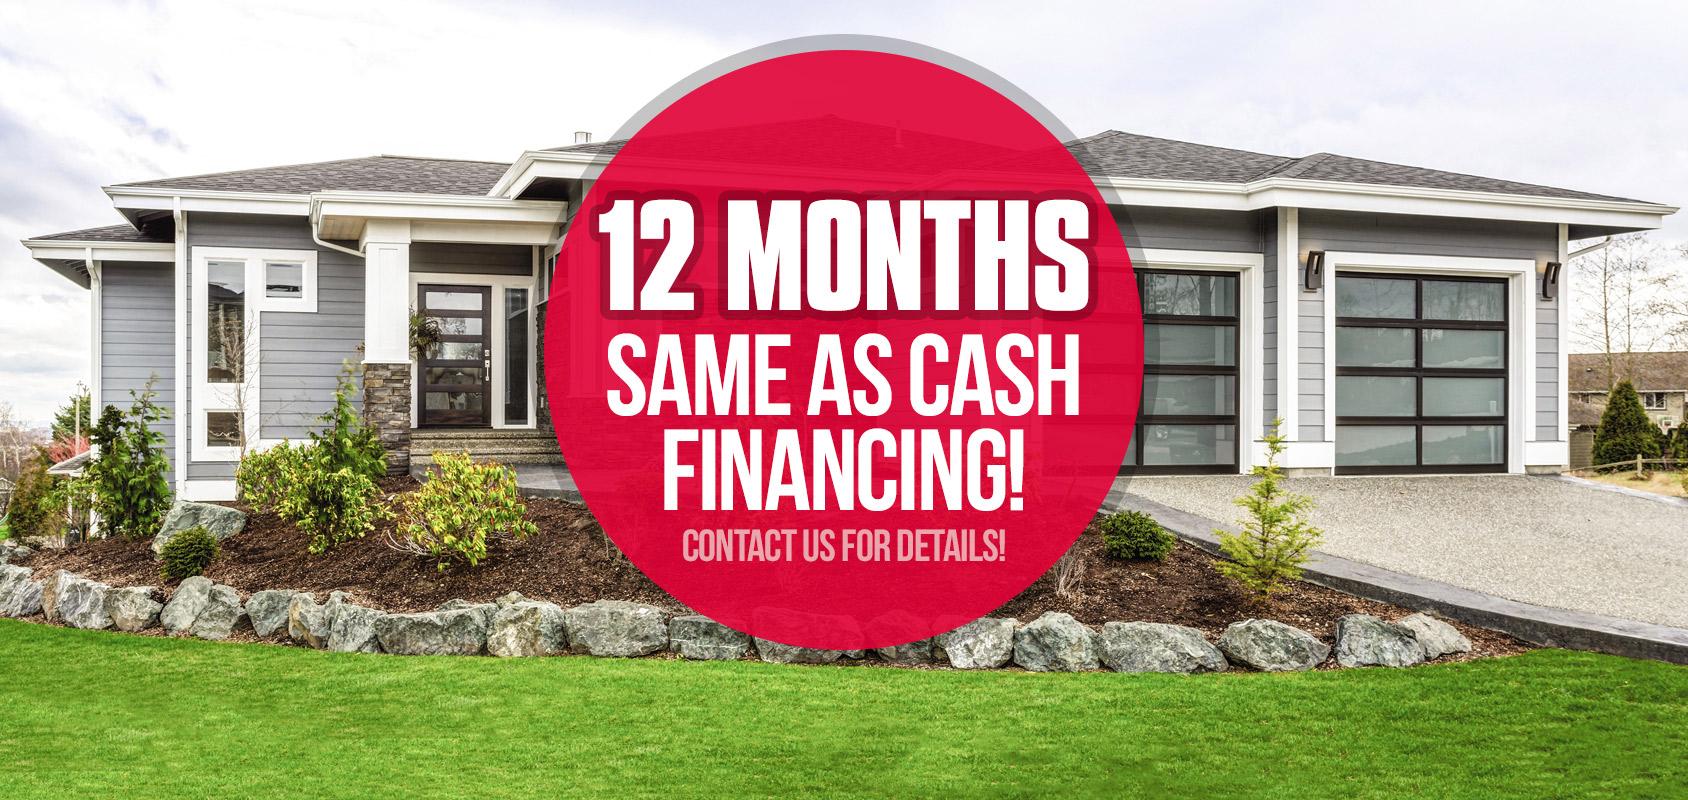 12 Months Same as Cash Financing